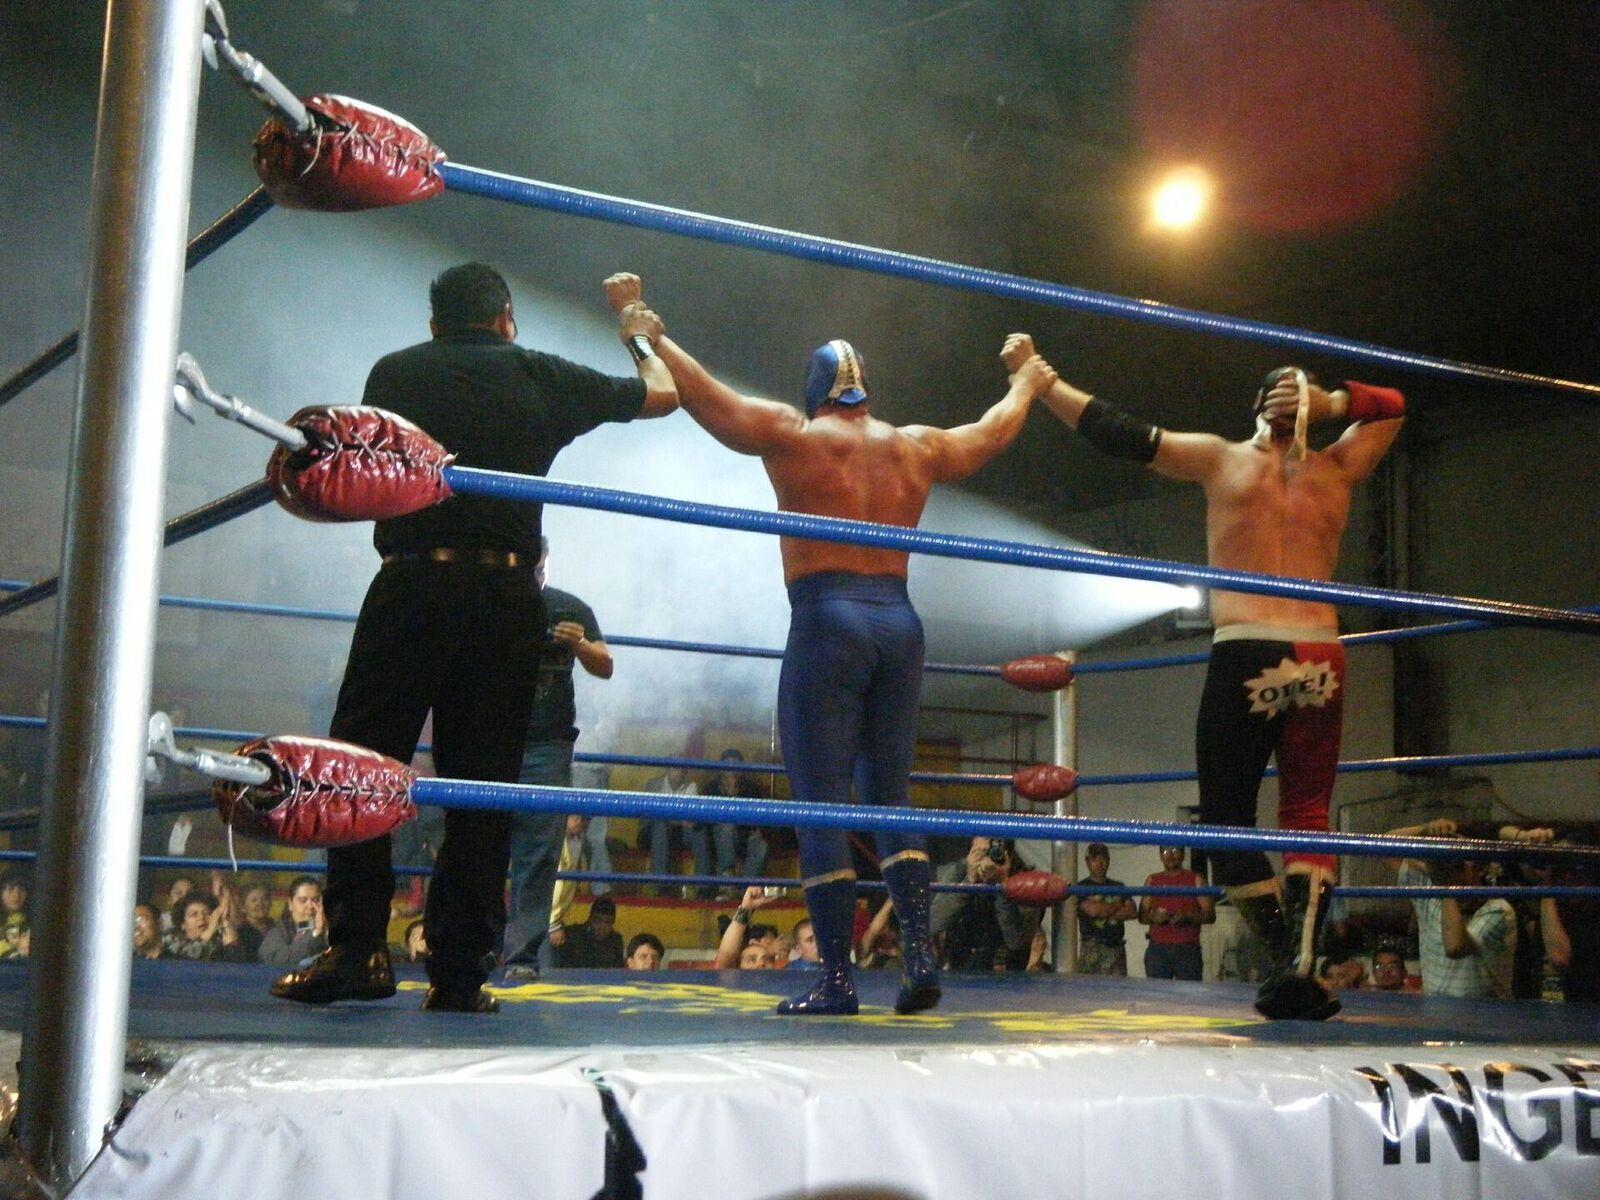 Wrestling mit Andreas Gabalier